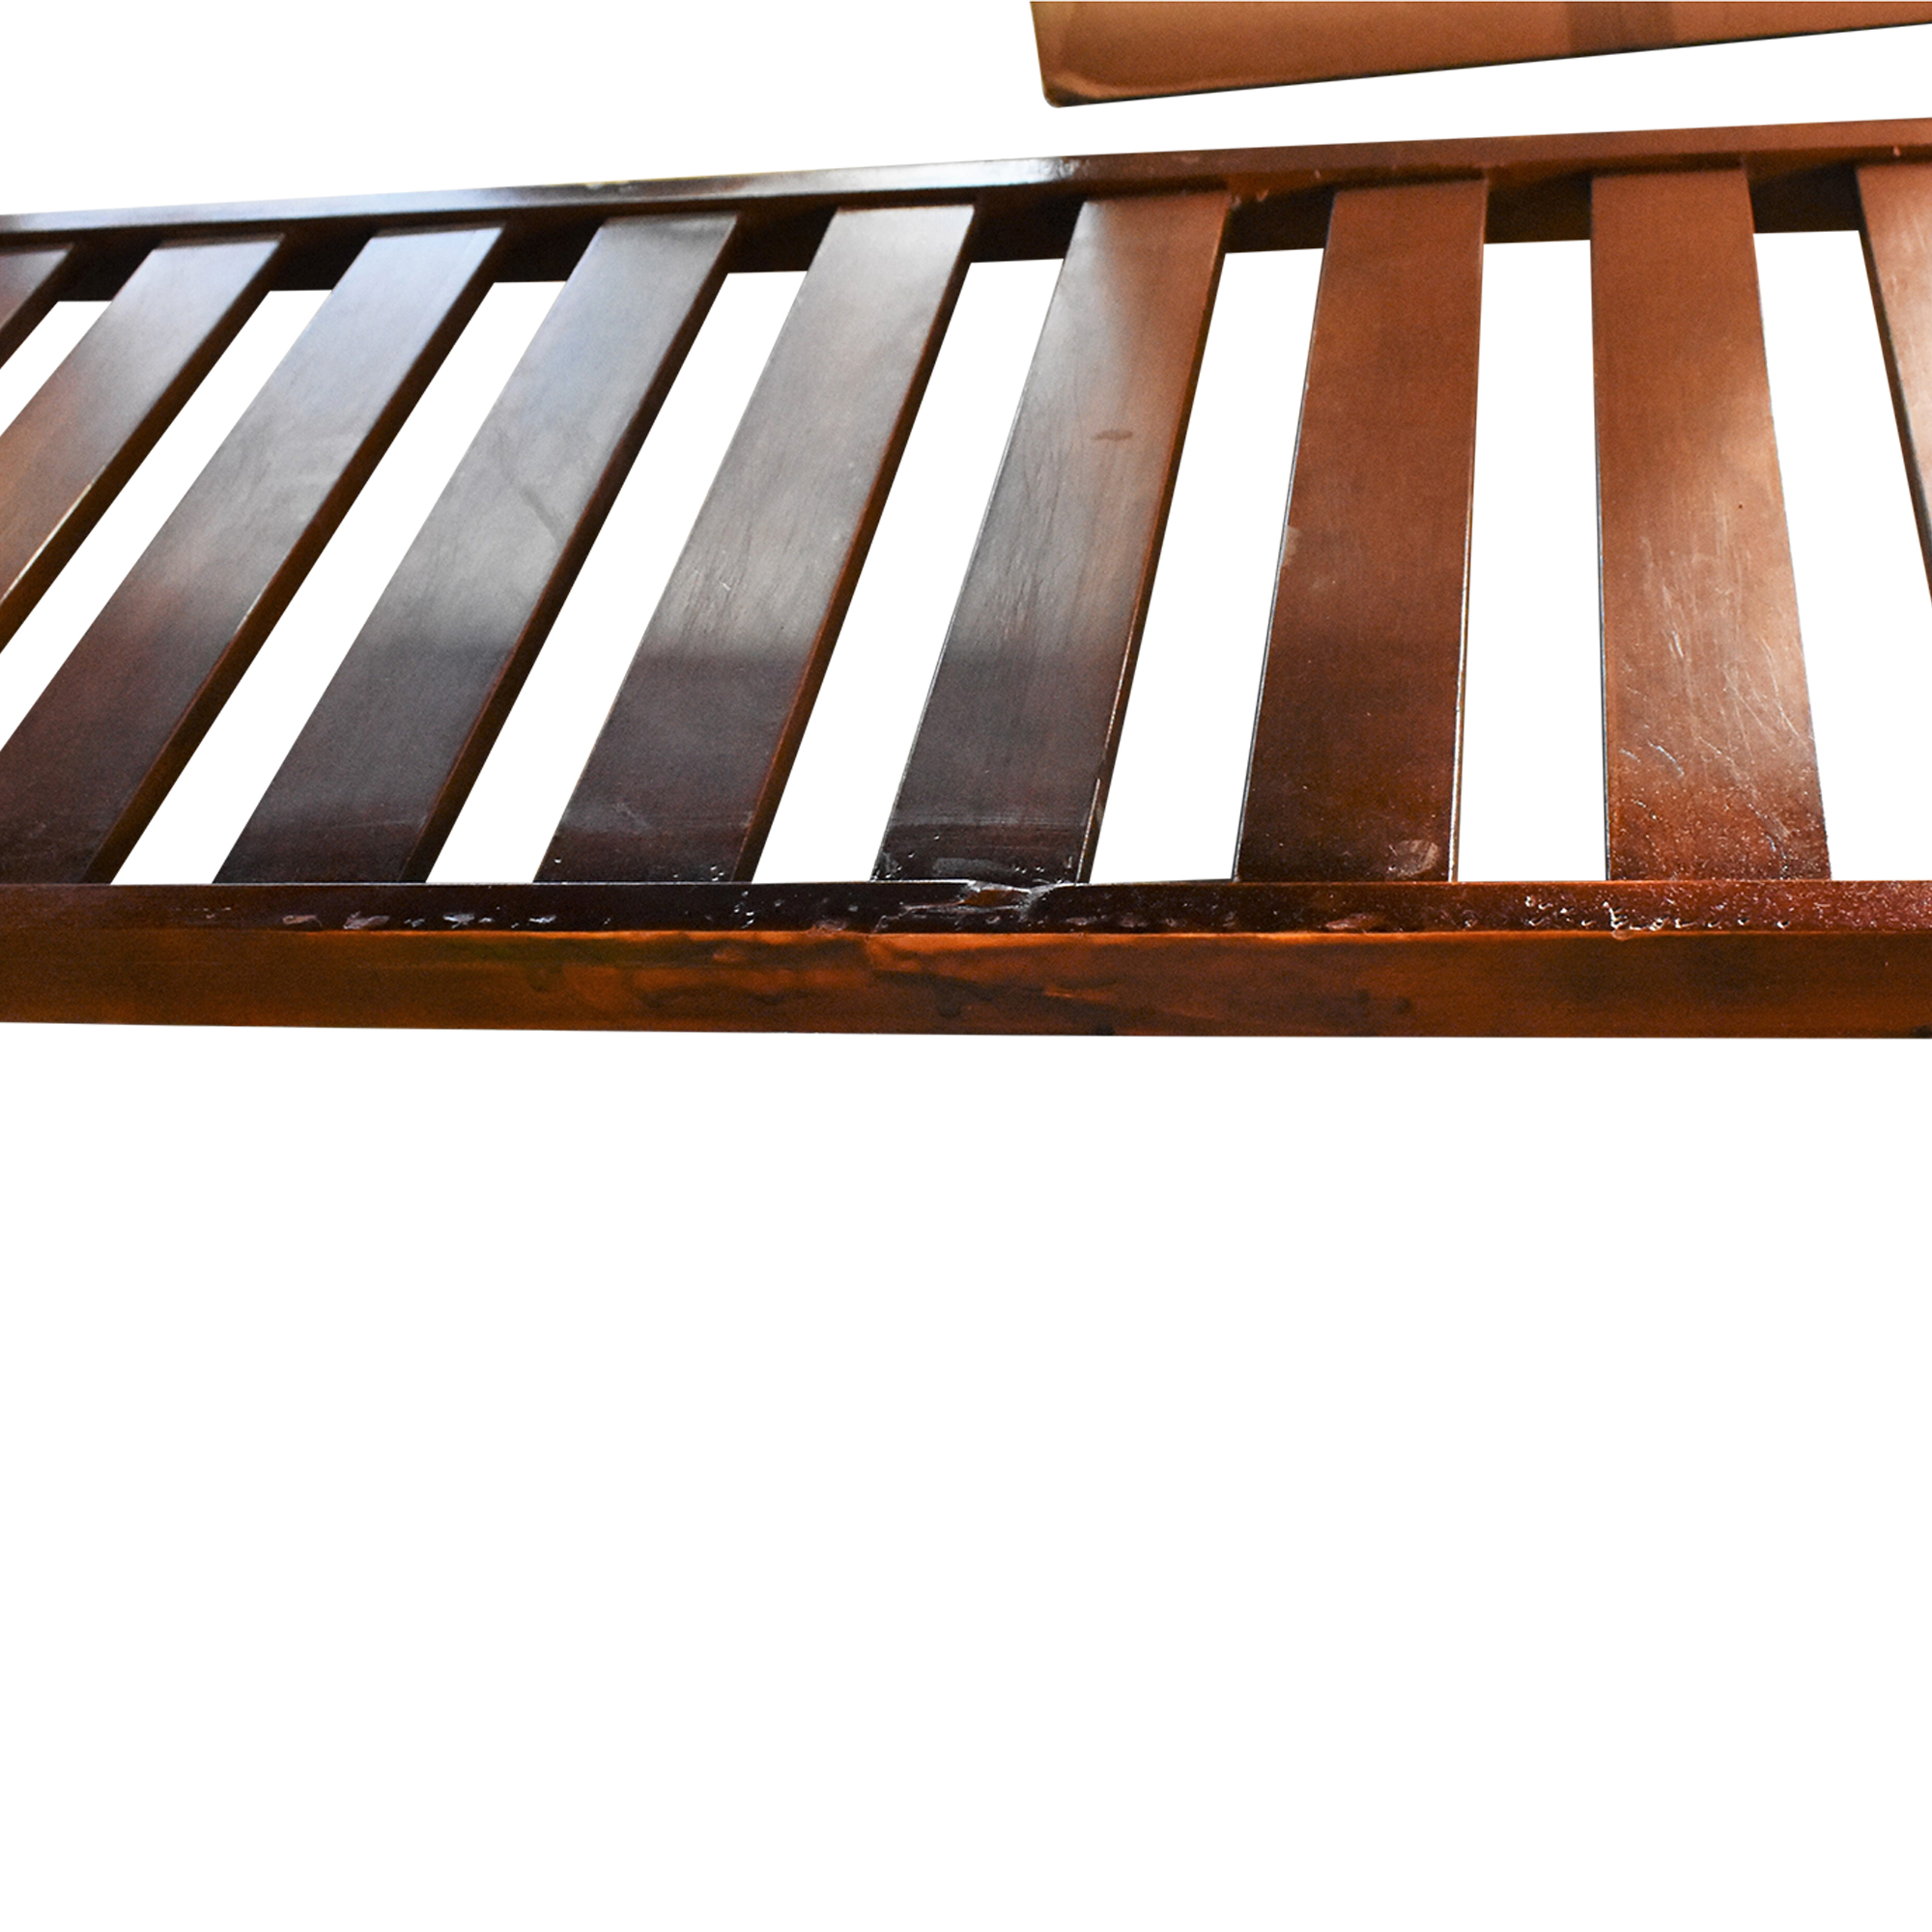 buy Ethan Allen American Impressions Sideboard Ethan Allen Cabinets & Sideboards